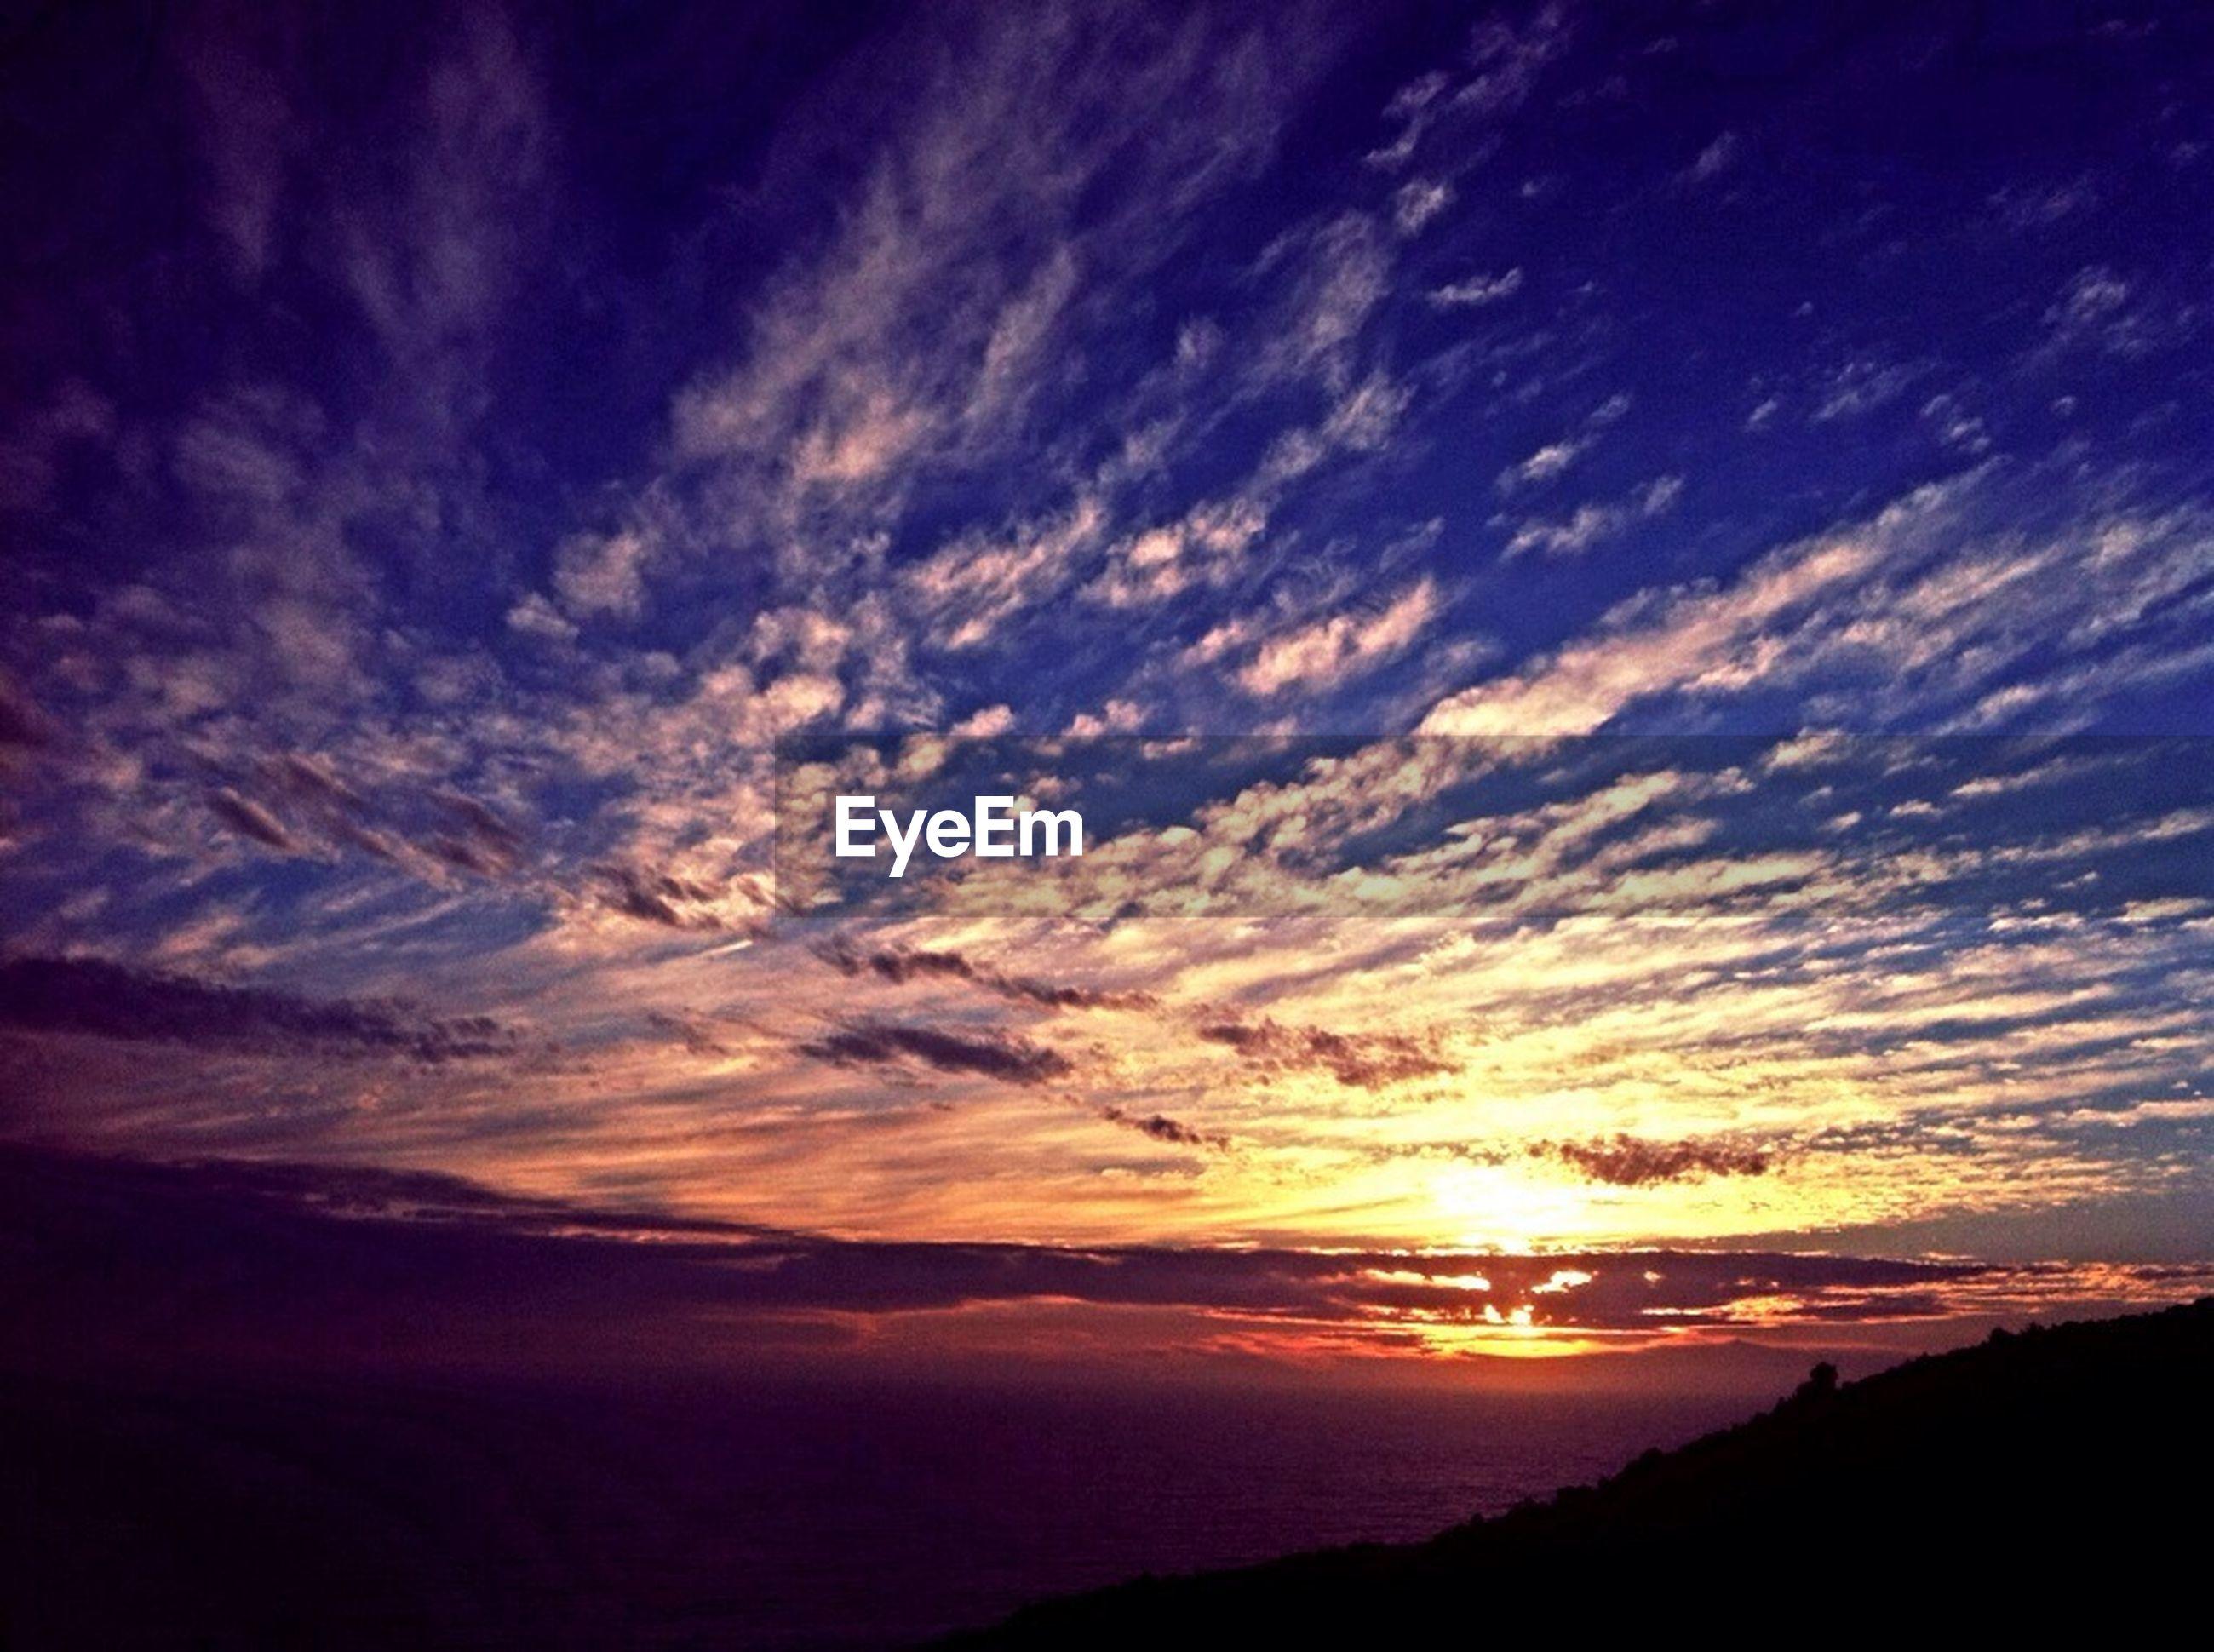 scenics, tranquil scene, sunset, sky, tranquility, beauty in nature, silhouette, cloud - sky, nature, idyllic, sun, cloud, sunlight, sea, sunbeam, majestic, landscape, dramatic sky, outdoors, cloudy